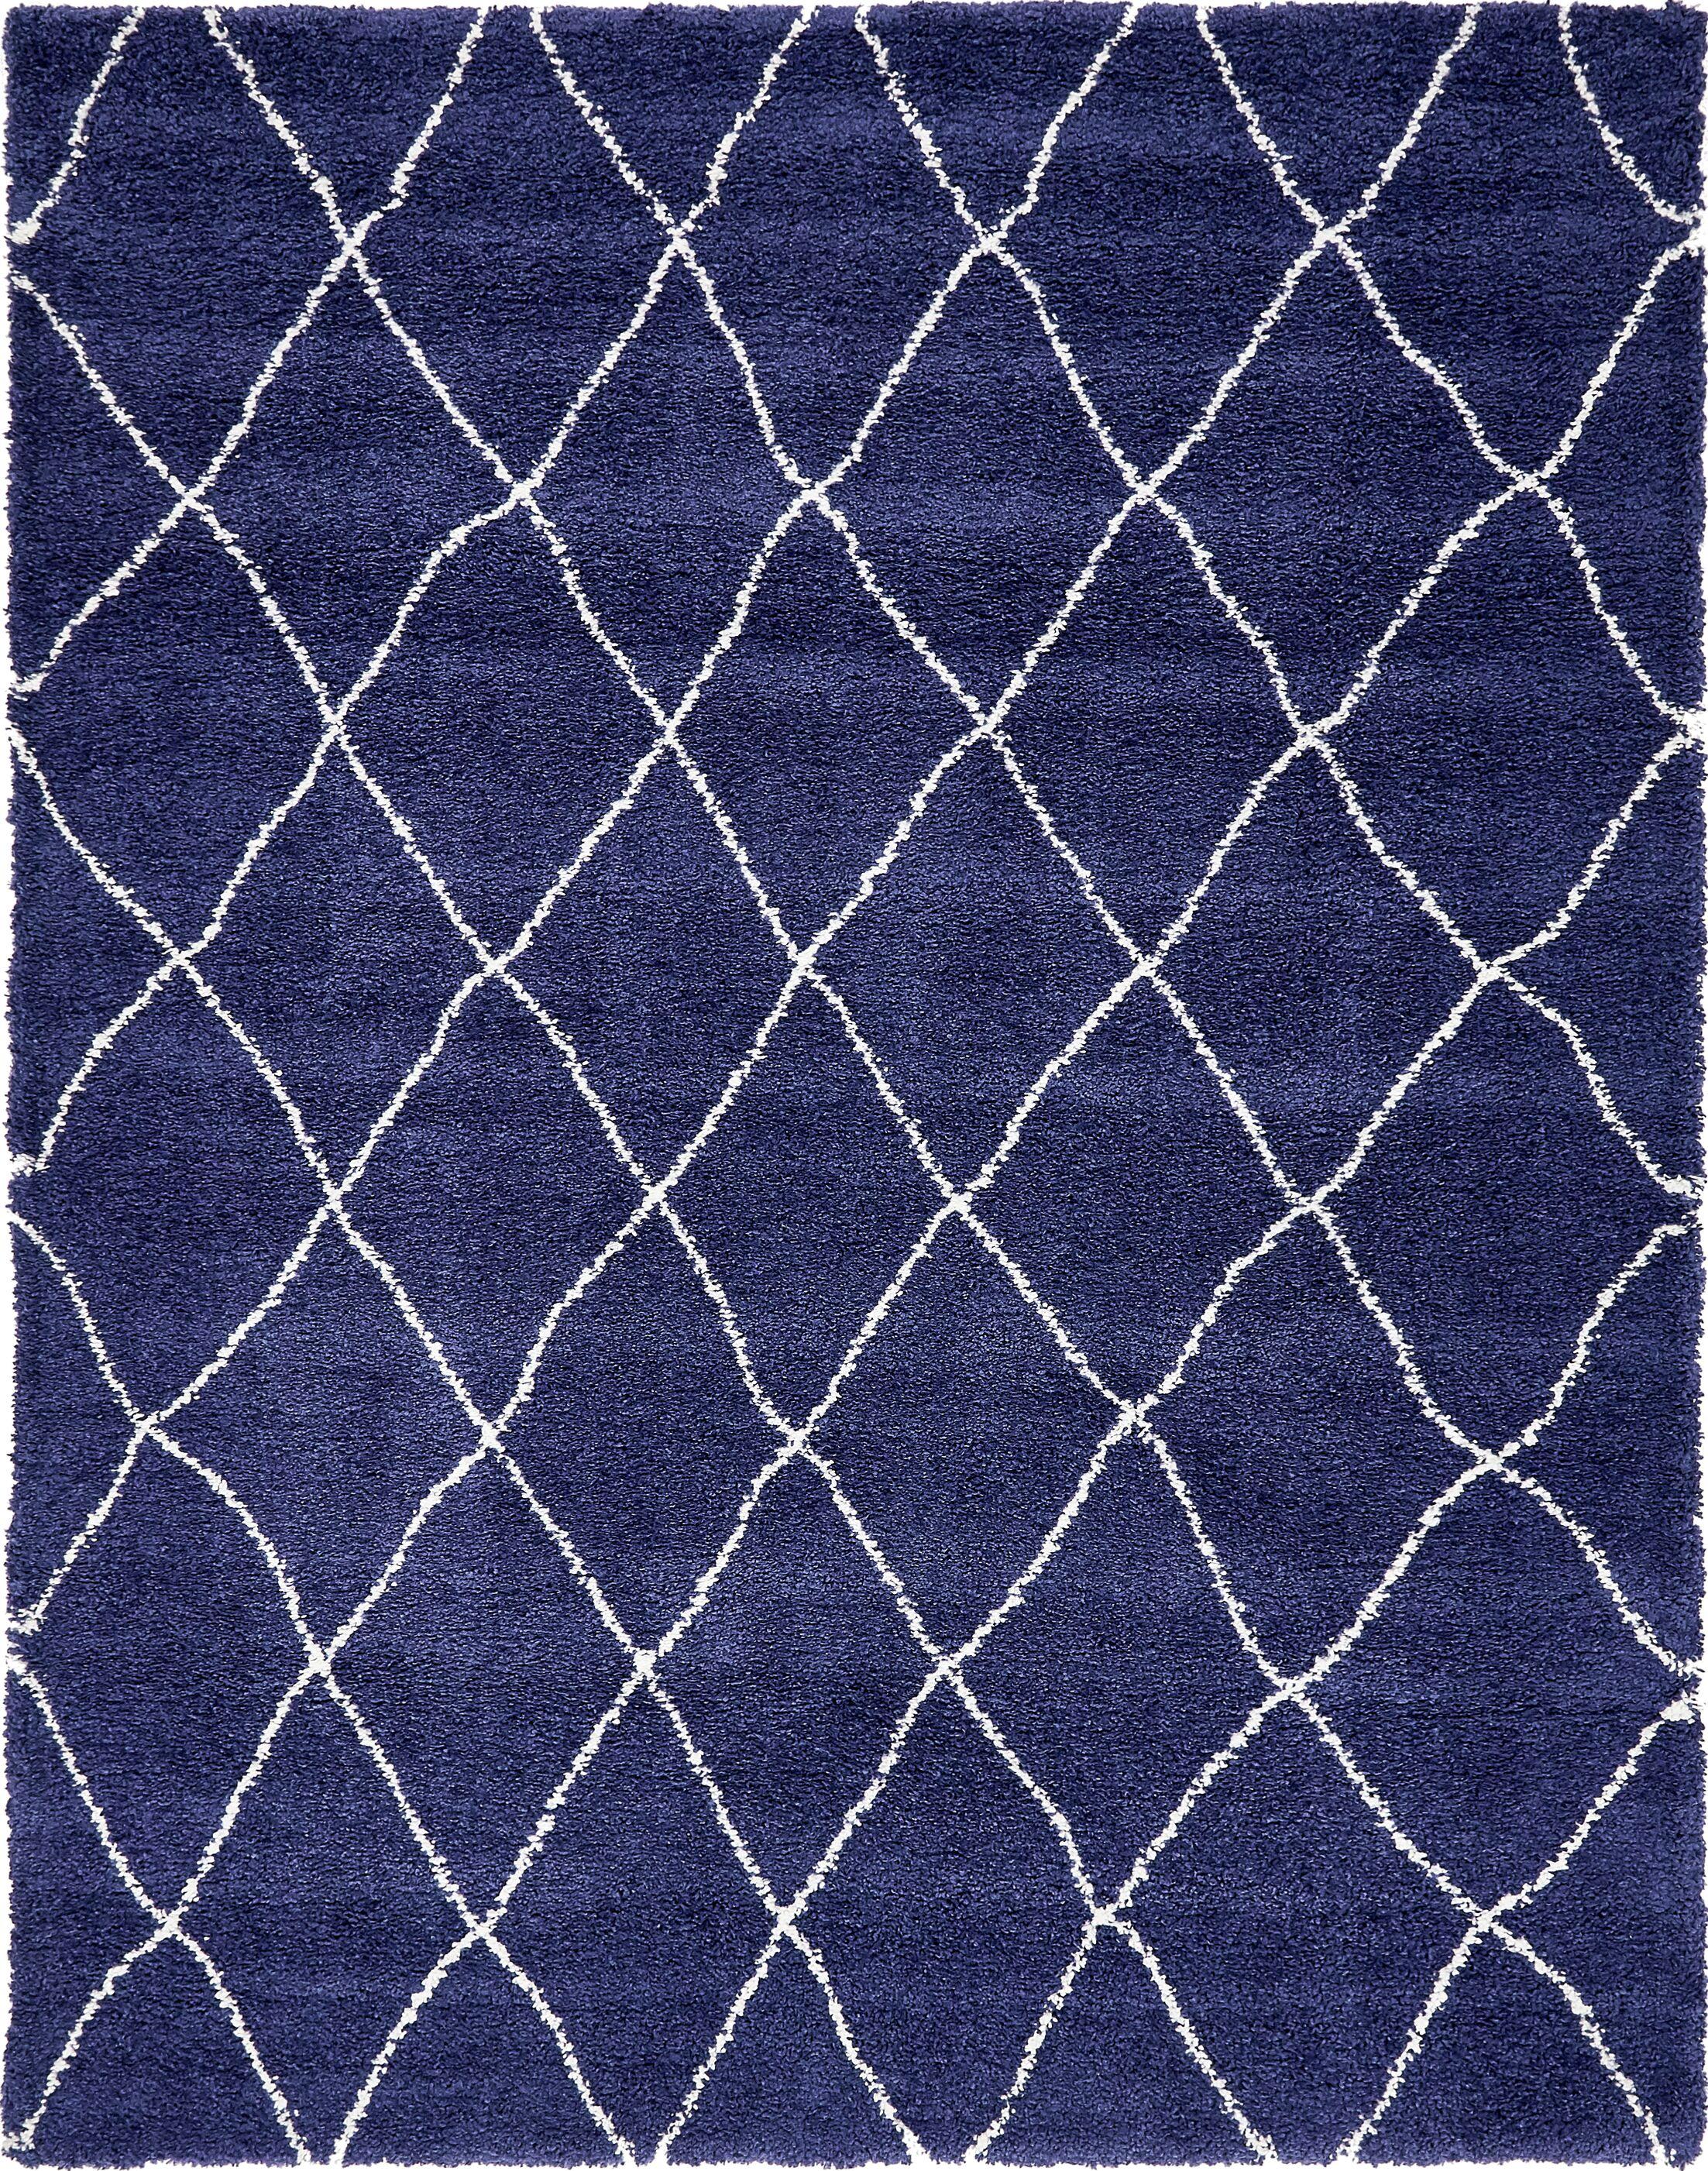 Cynthiana  Navy Blue Area Rug Rug Size: Rectangle 8'  x 10'